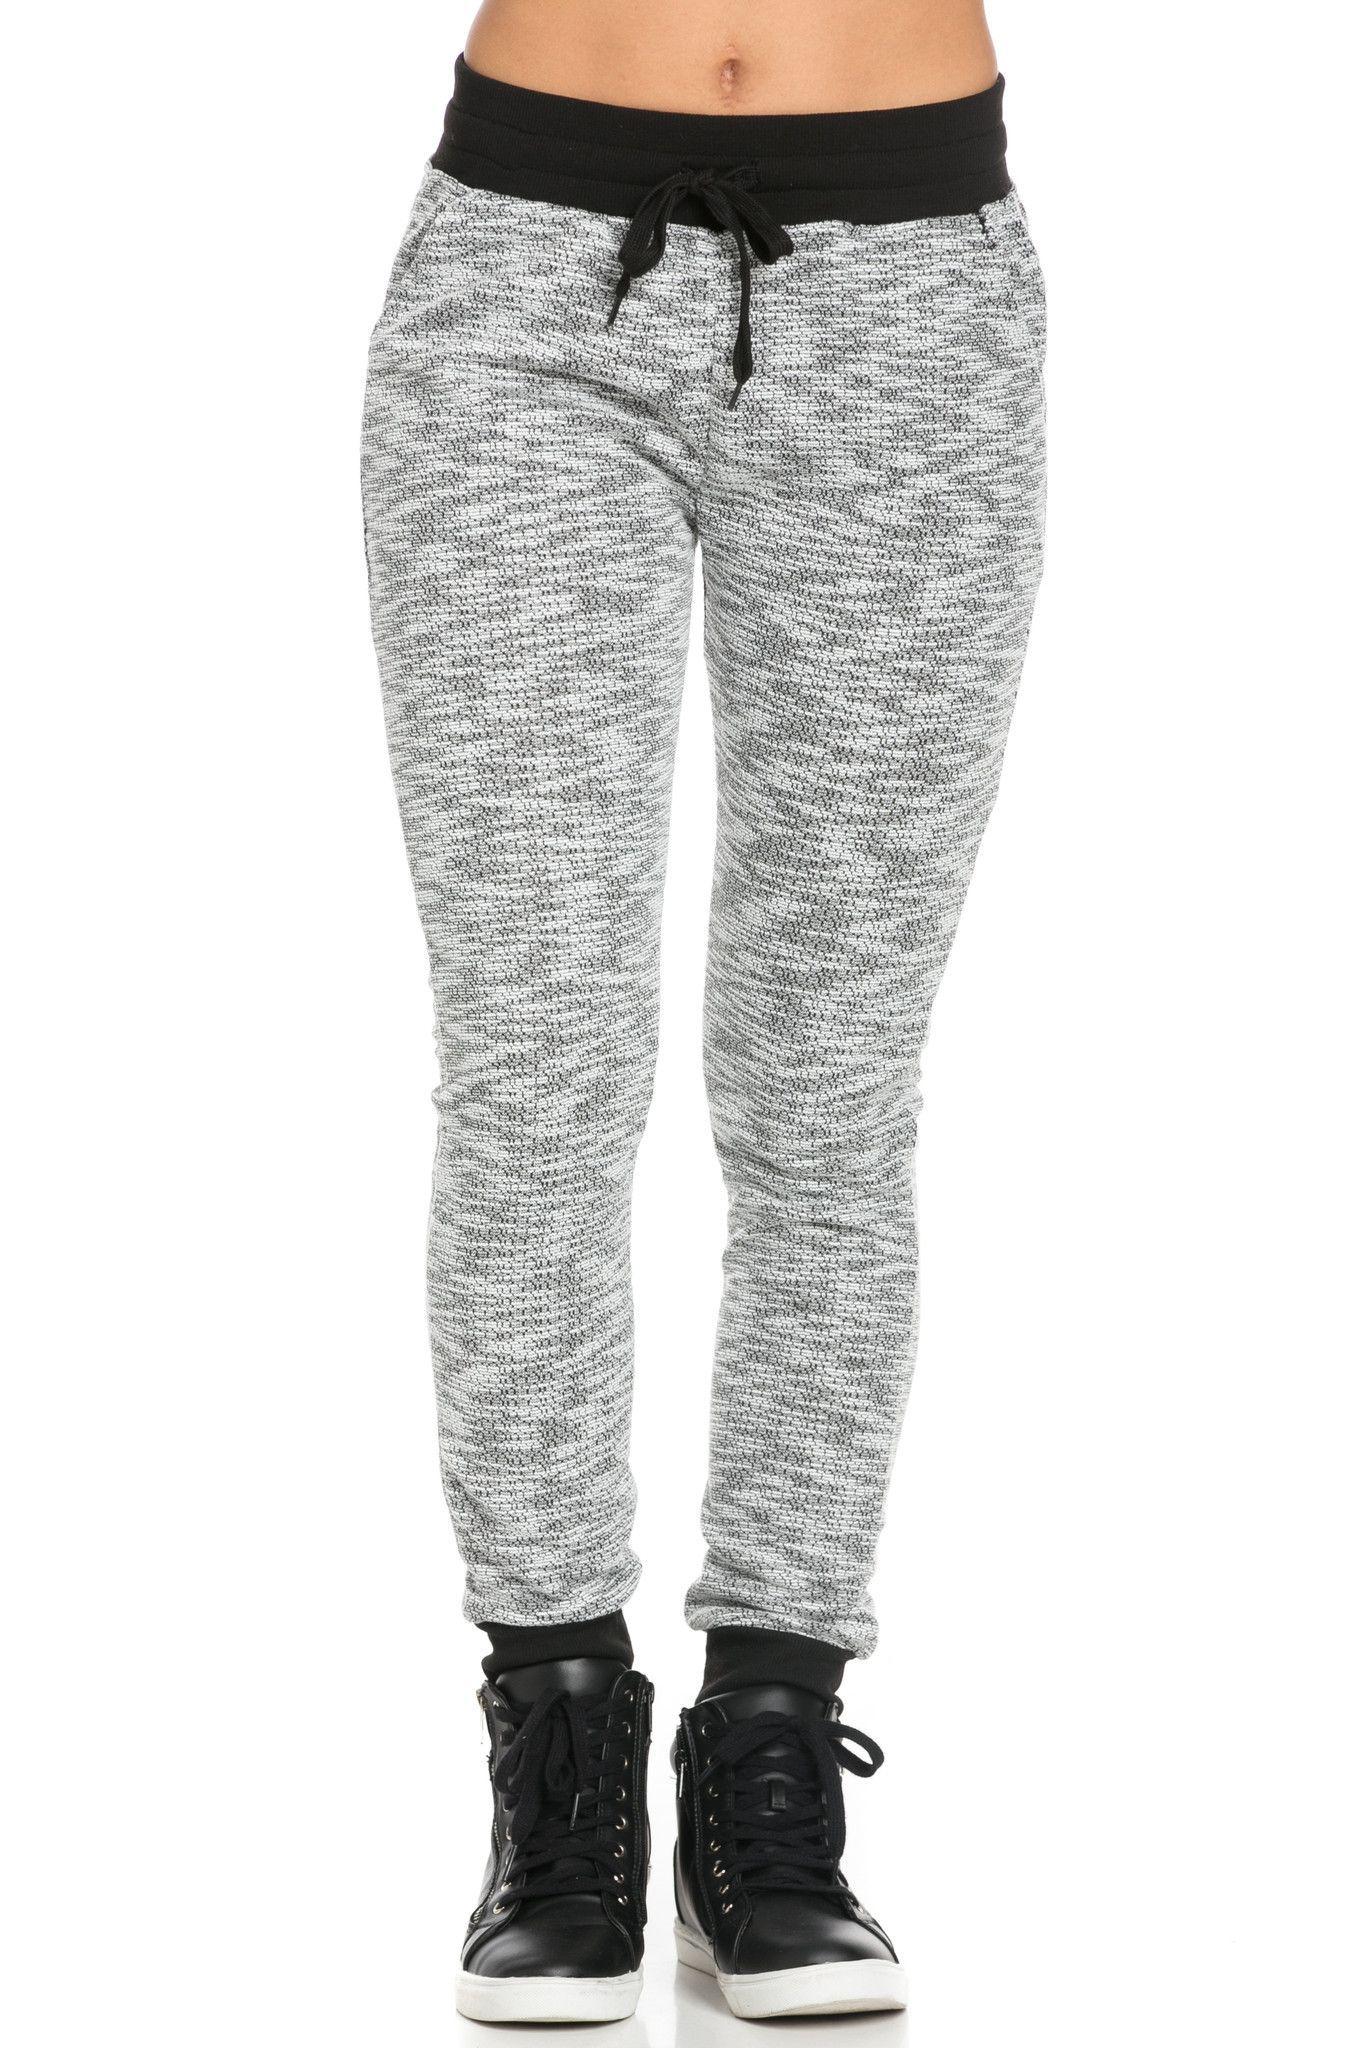 110 Ideas De Leggings Ropa Moda Pantalones